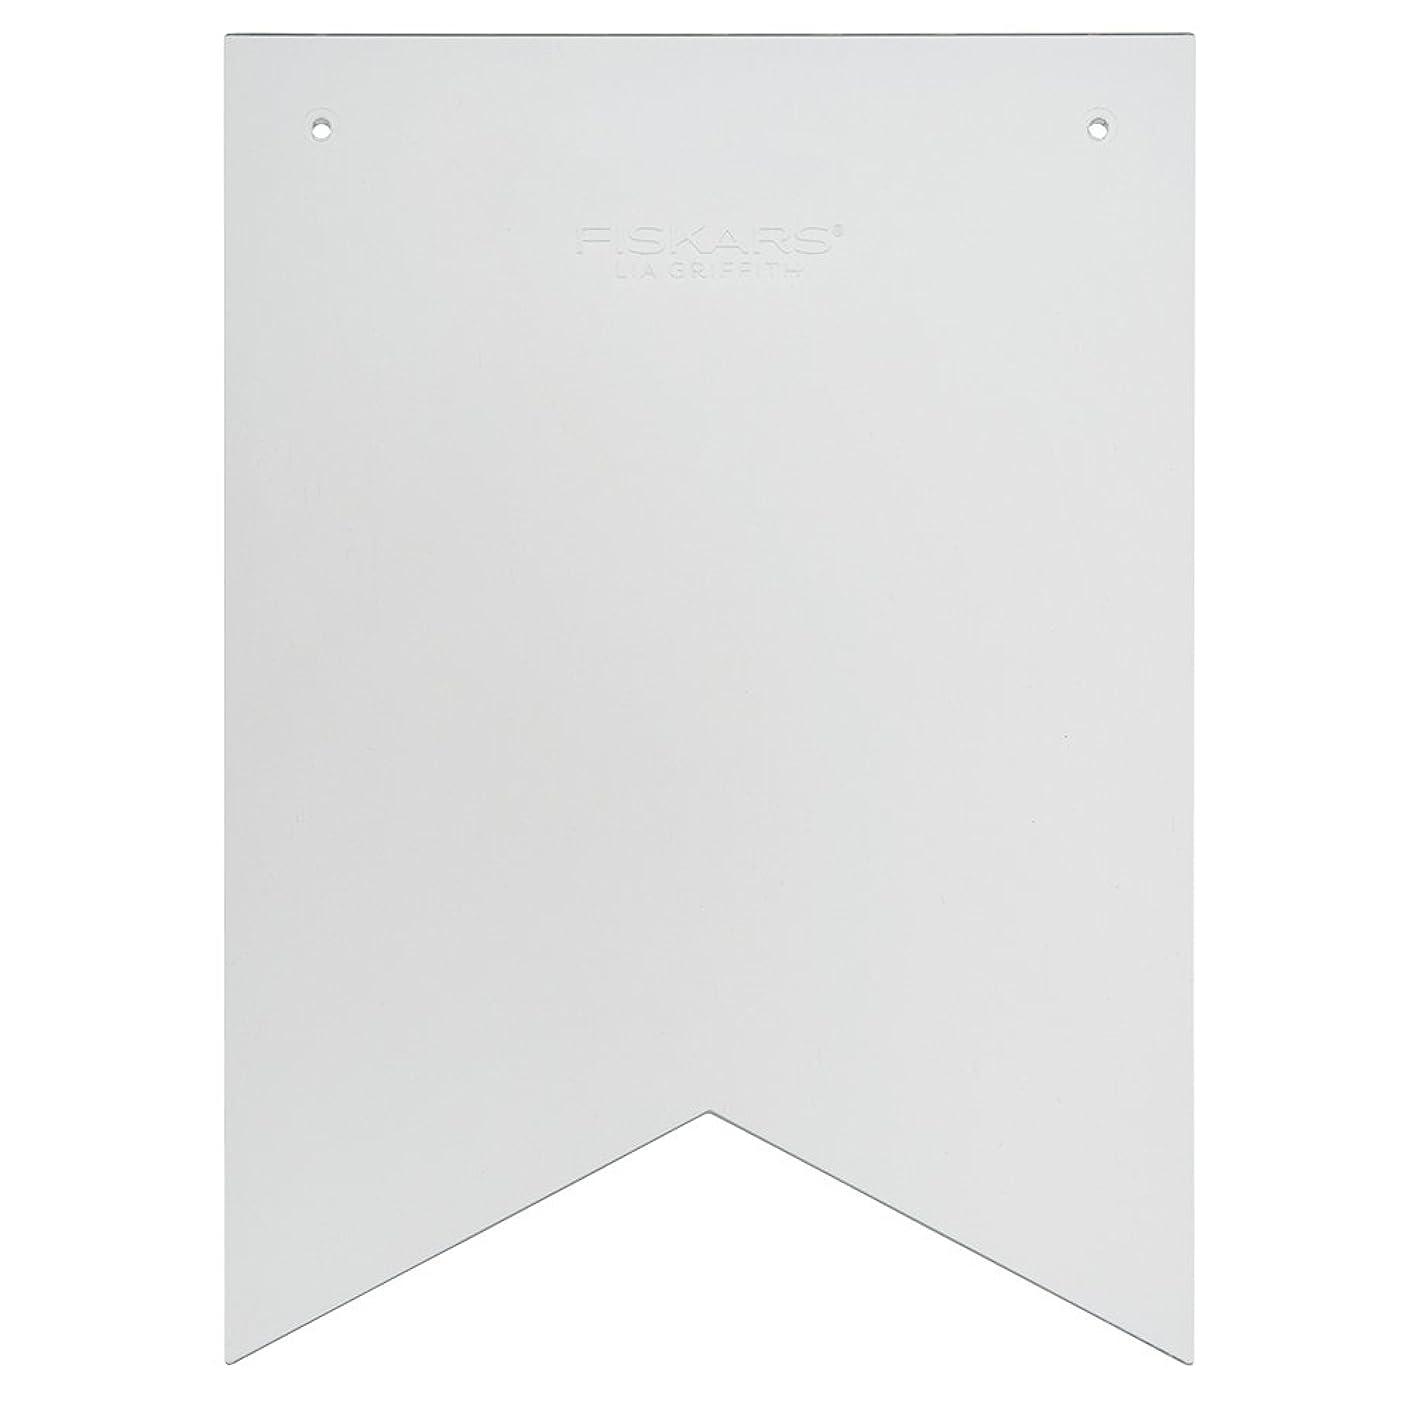 Fiskars 105240-1001 Lia Griffith Designer Pennant Banner Template, Clear